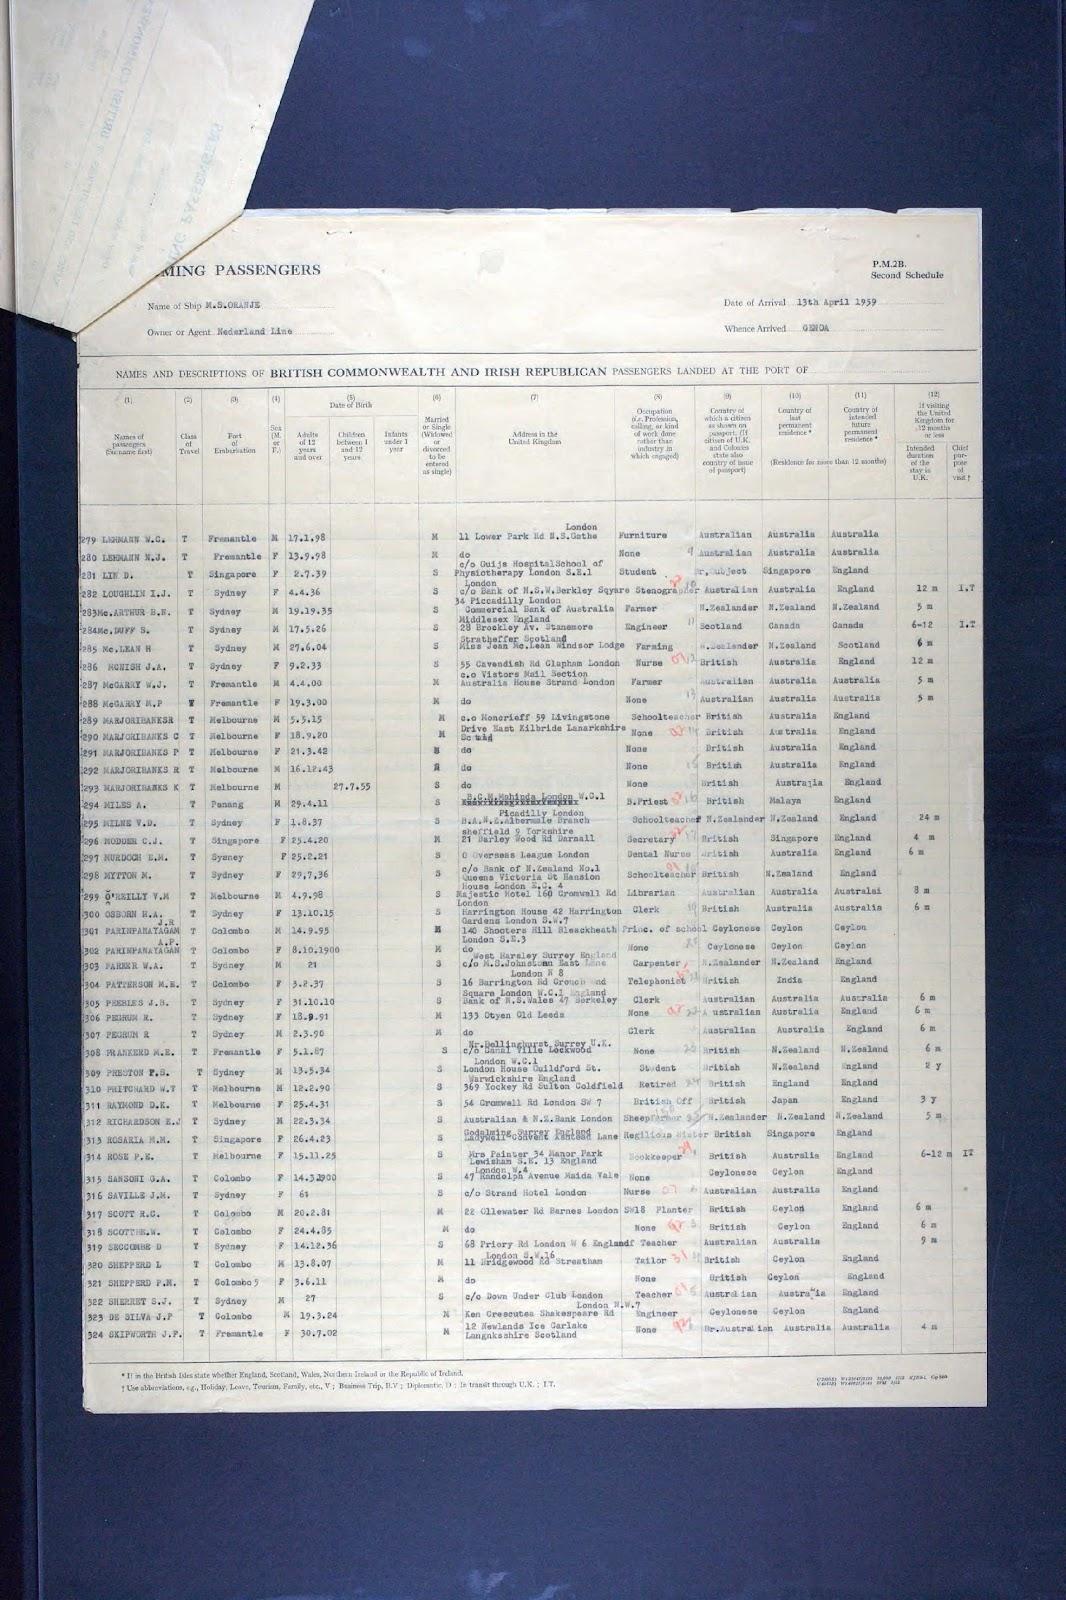 C:\Users\Main user\Documents\Ancestry\Dadaji\Anton Ships\Anton Miles Passage to England 1959.jpg